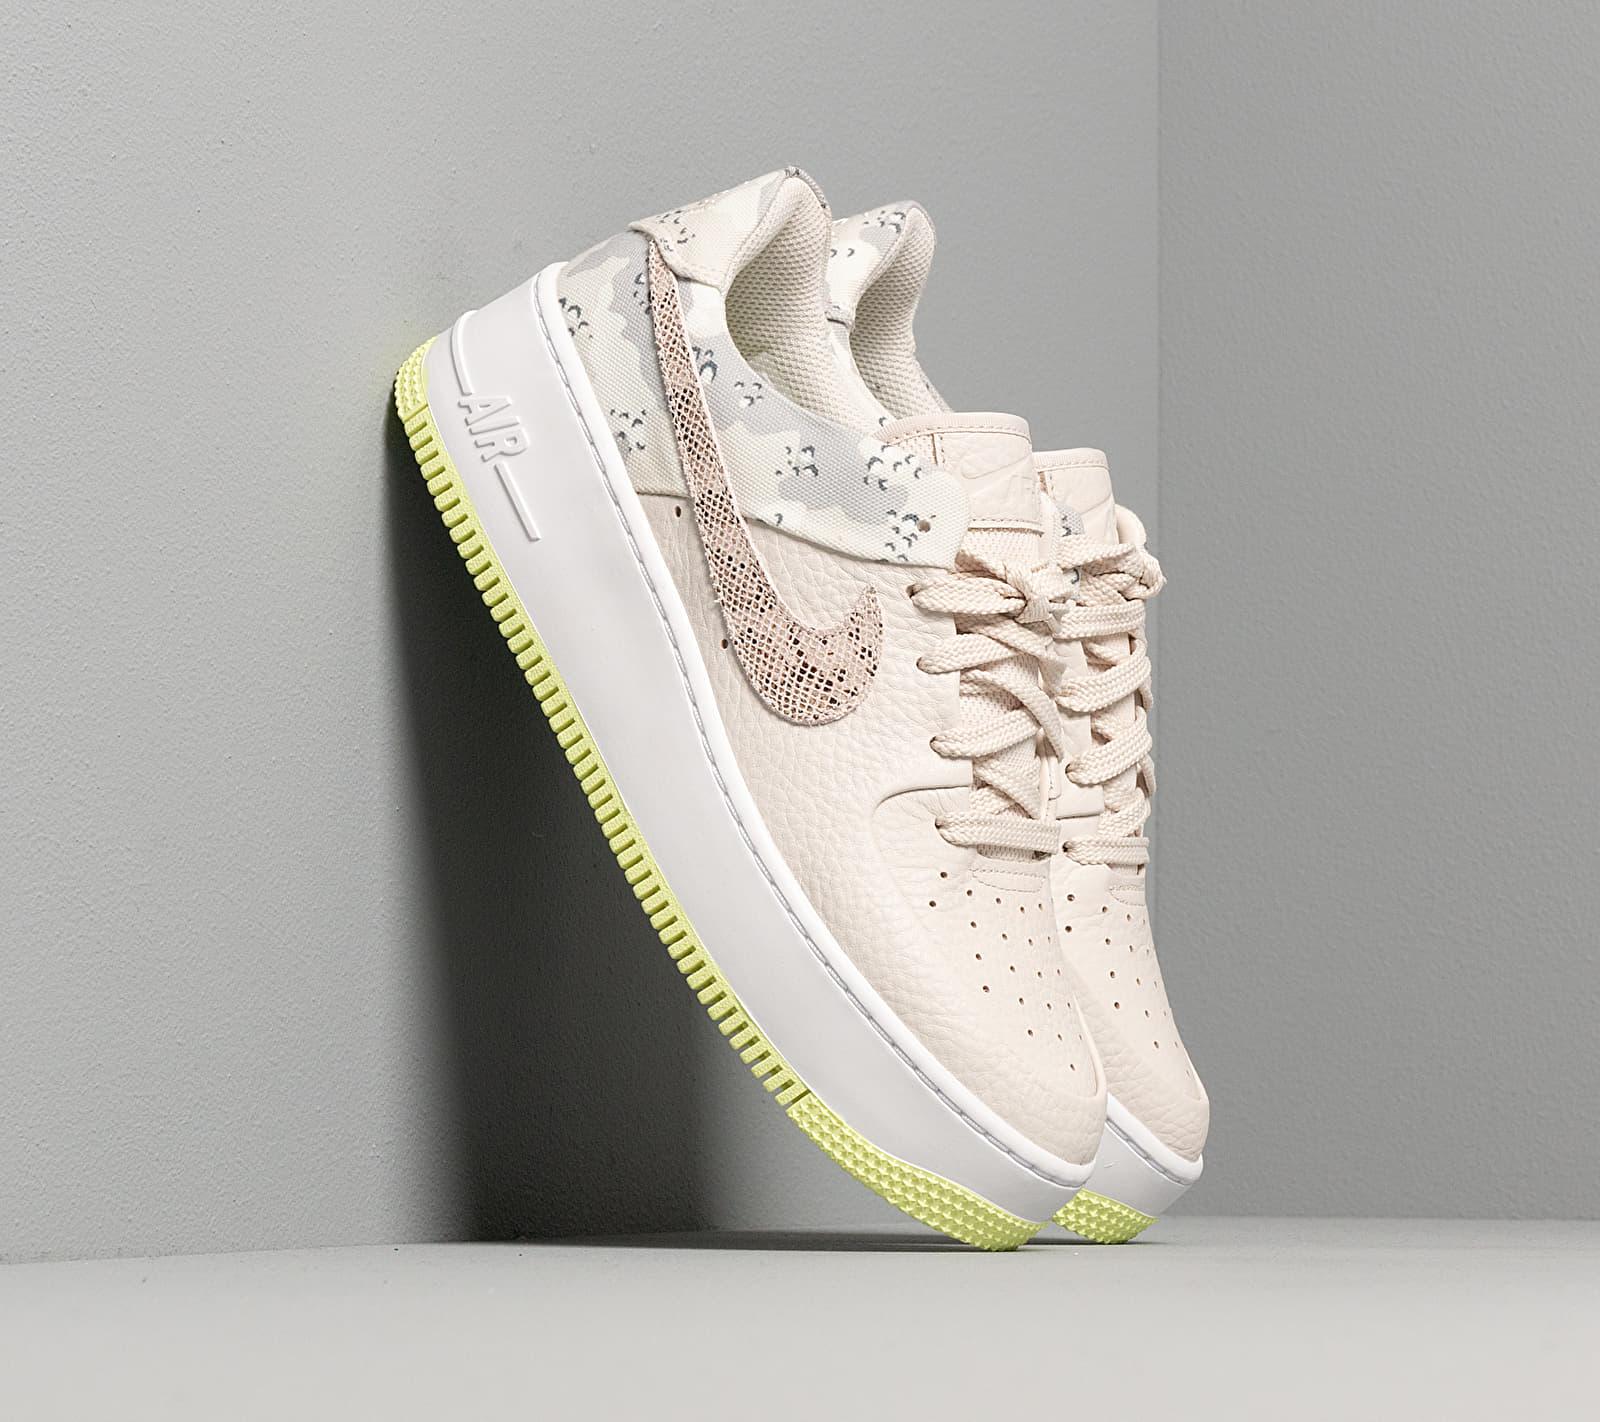 Nike W Air Force 1 Sage Lo Premium Light Orewood Brown/ Moon Particle-White